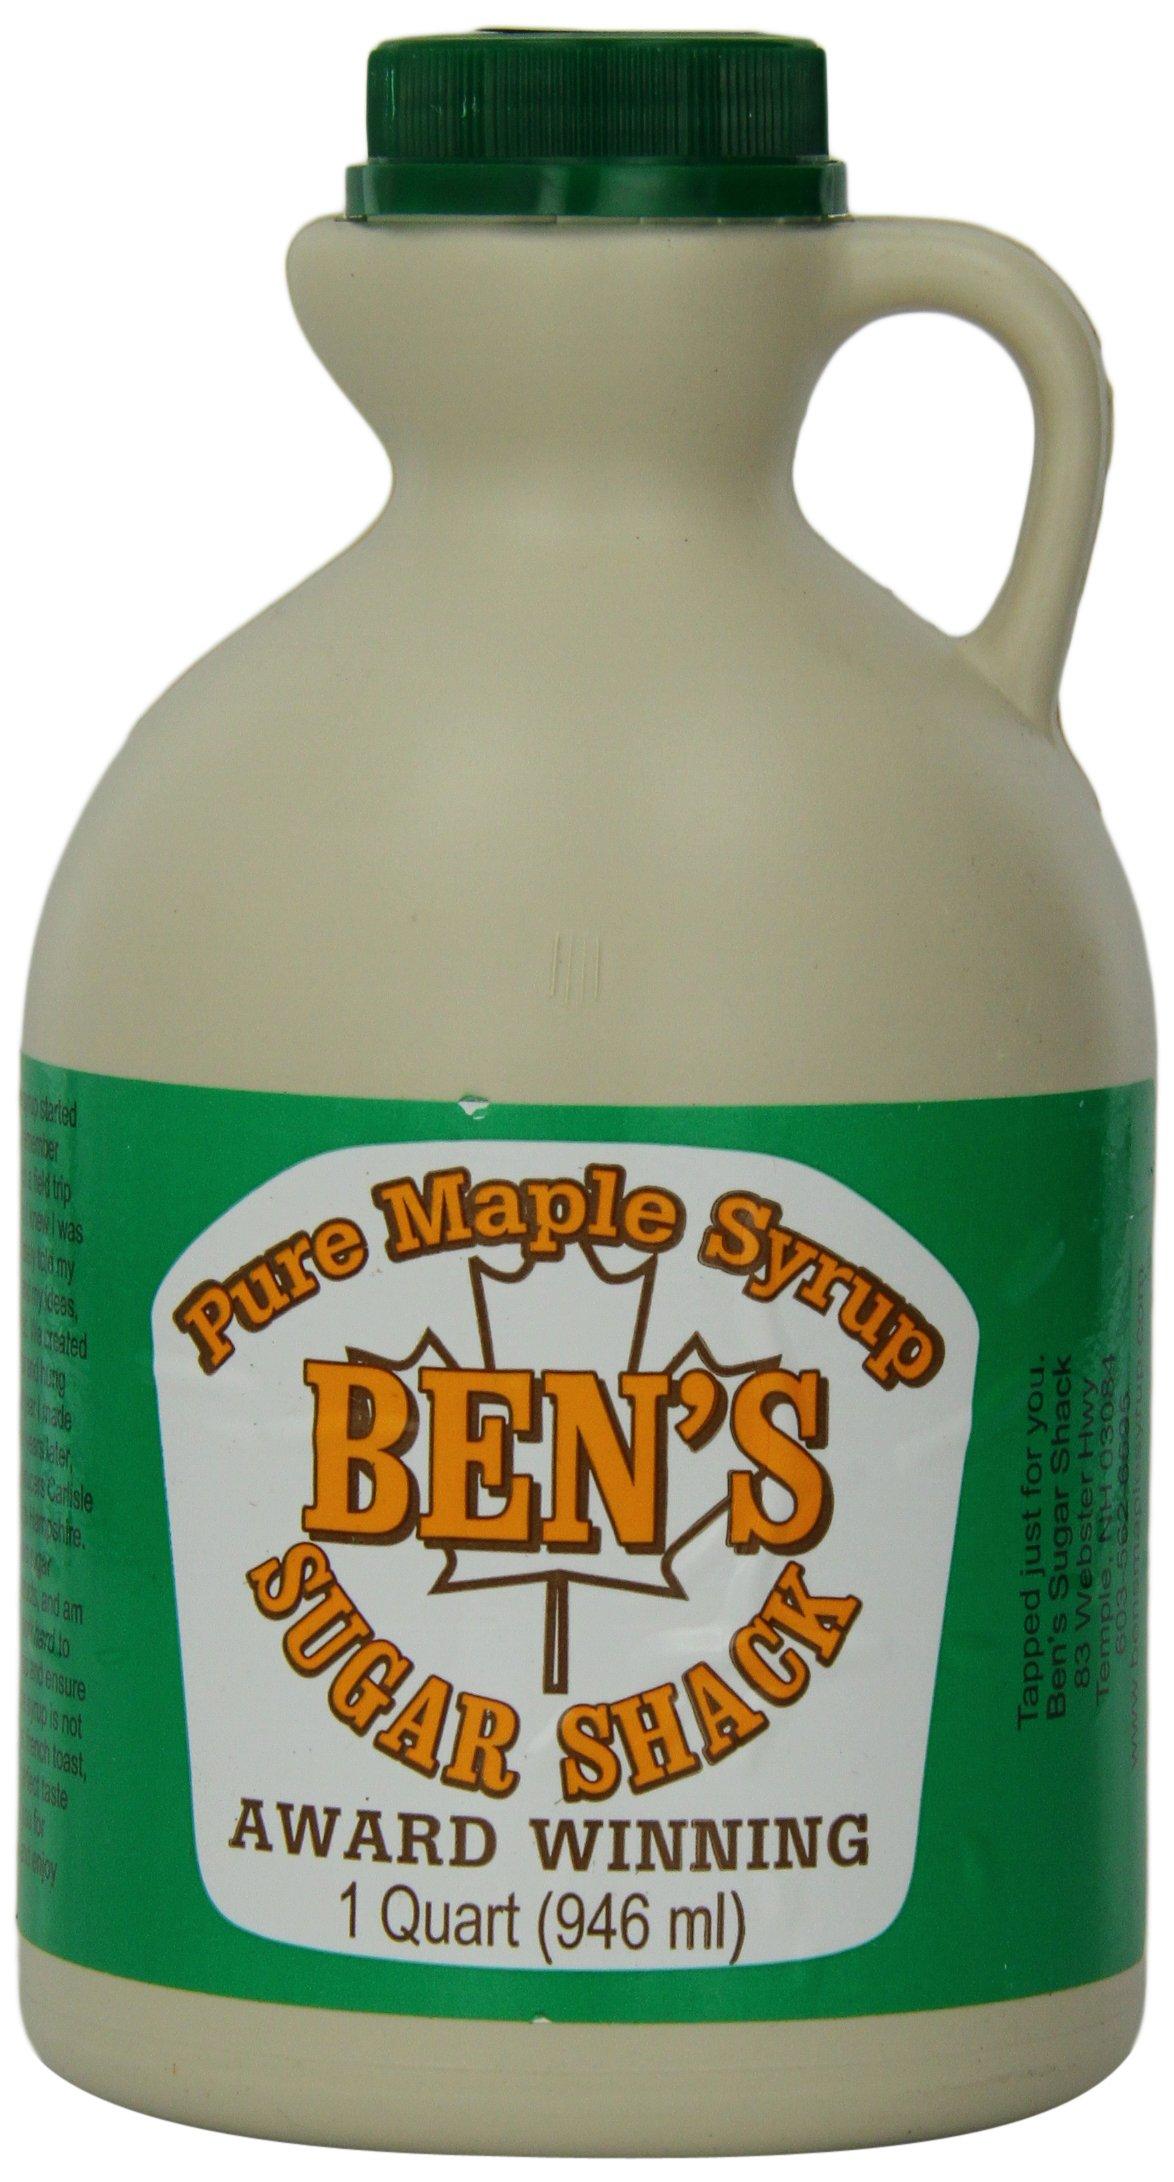 Ben's Sugar Shack, Grade A Dark Amber, of Pure Maple Syrup Award Winning, 1 Quart (946 ml)